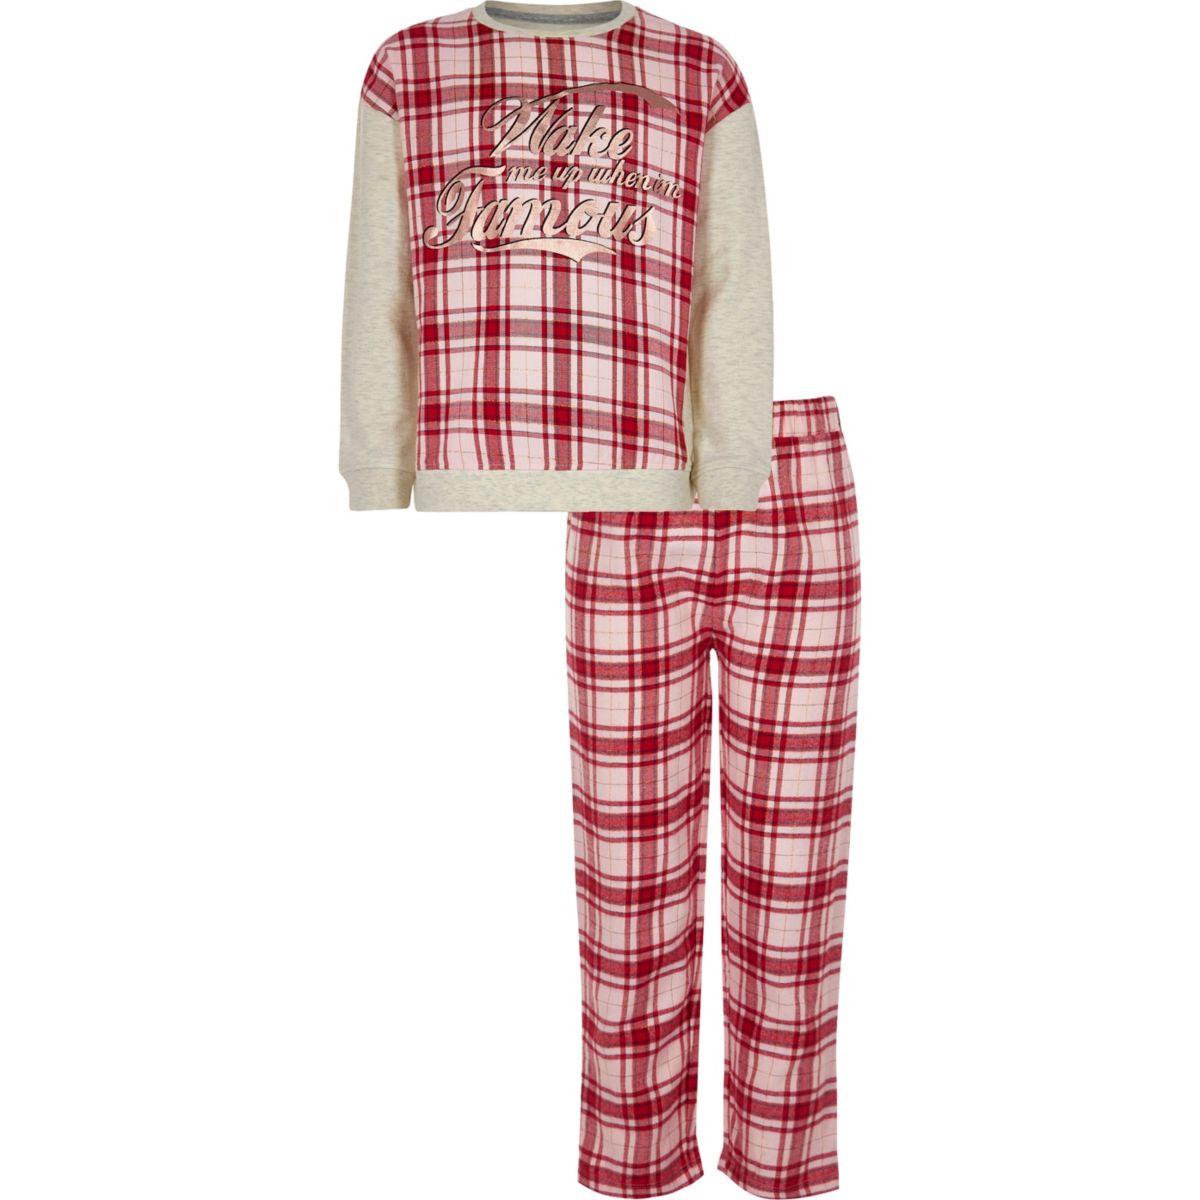 Girls red 'wake me up' check pajama set